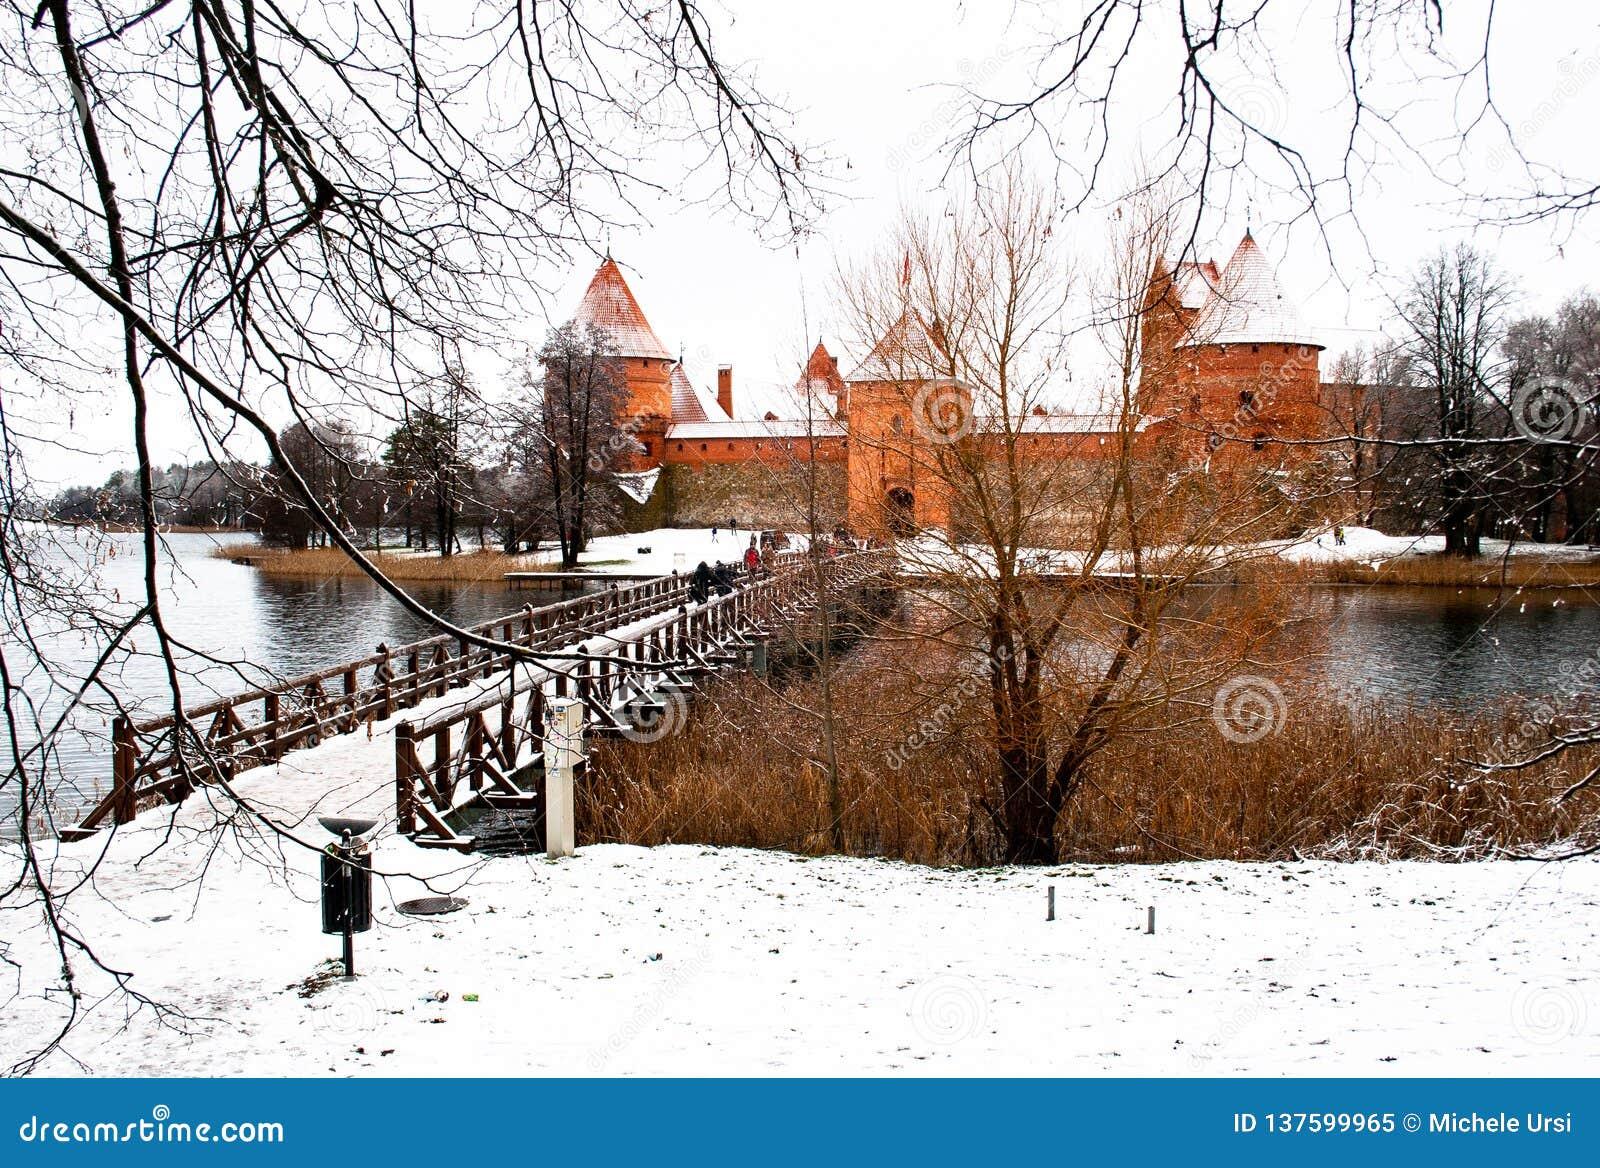 Medieval castle of Trakai, Vilnius, Lithuania, Eastern Europe, in winter